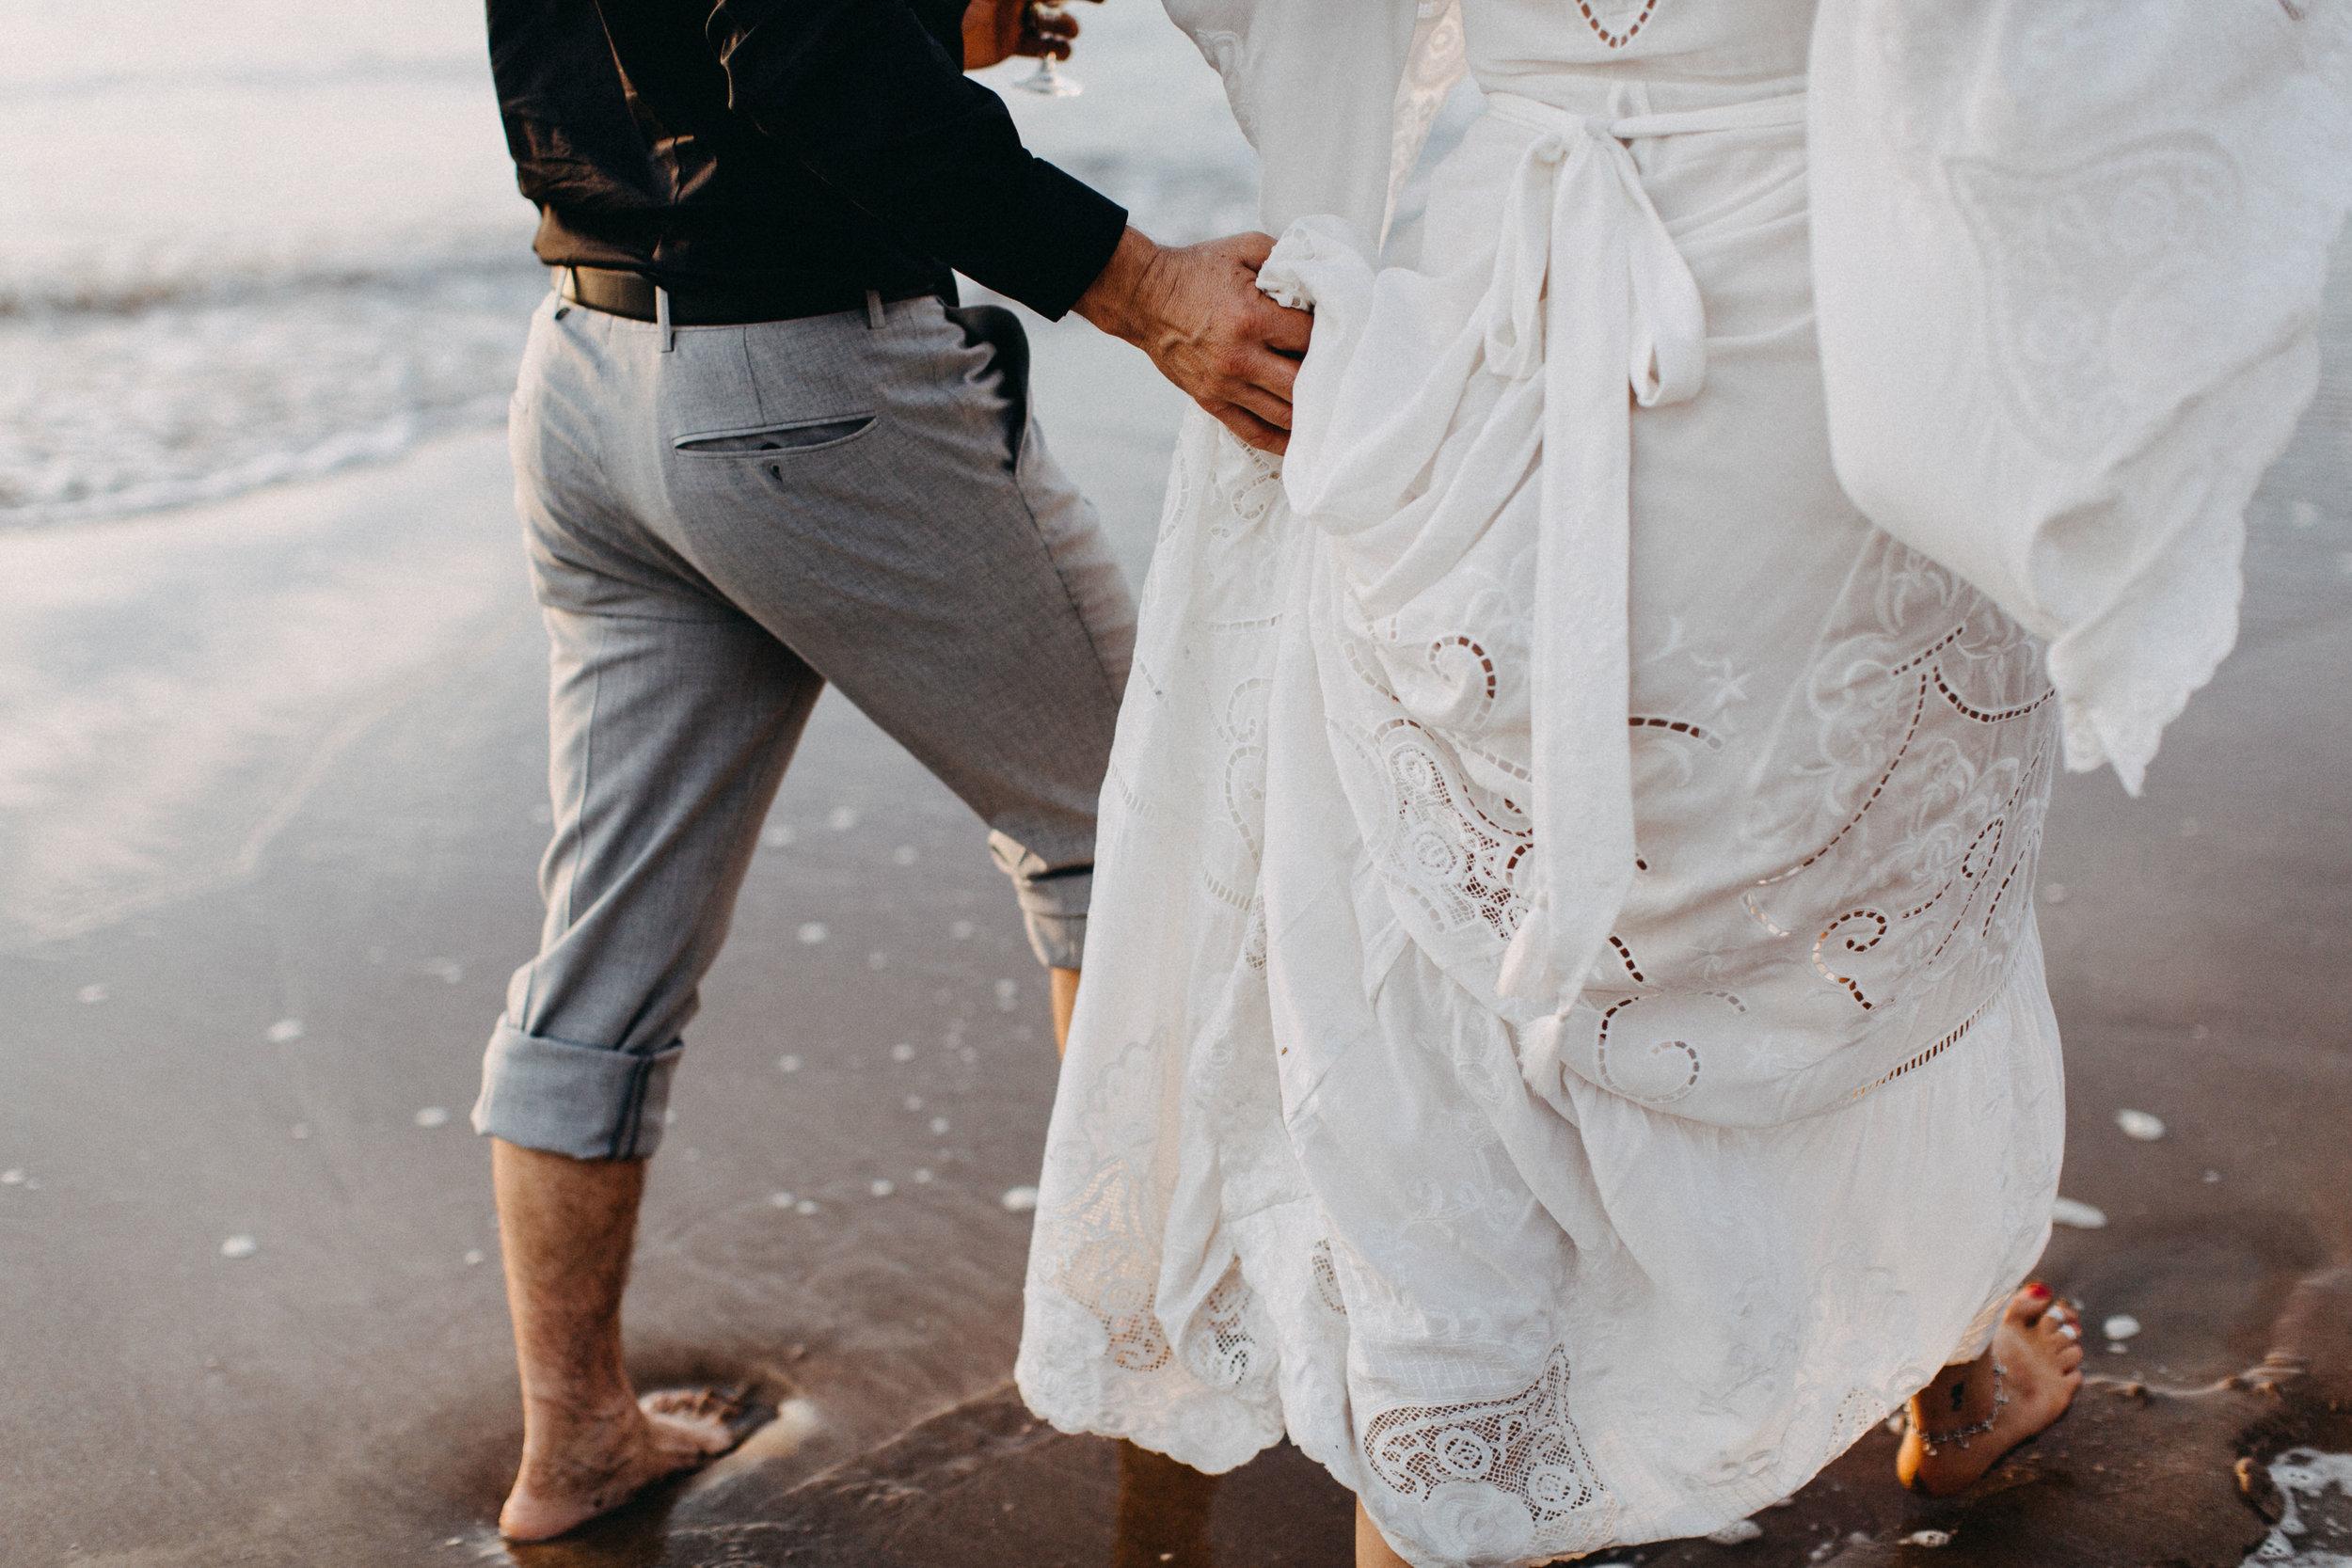 darwin-elopement-wedding-beach-camden-photography-www.emilyobrienphotography.net-73.jpg